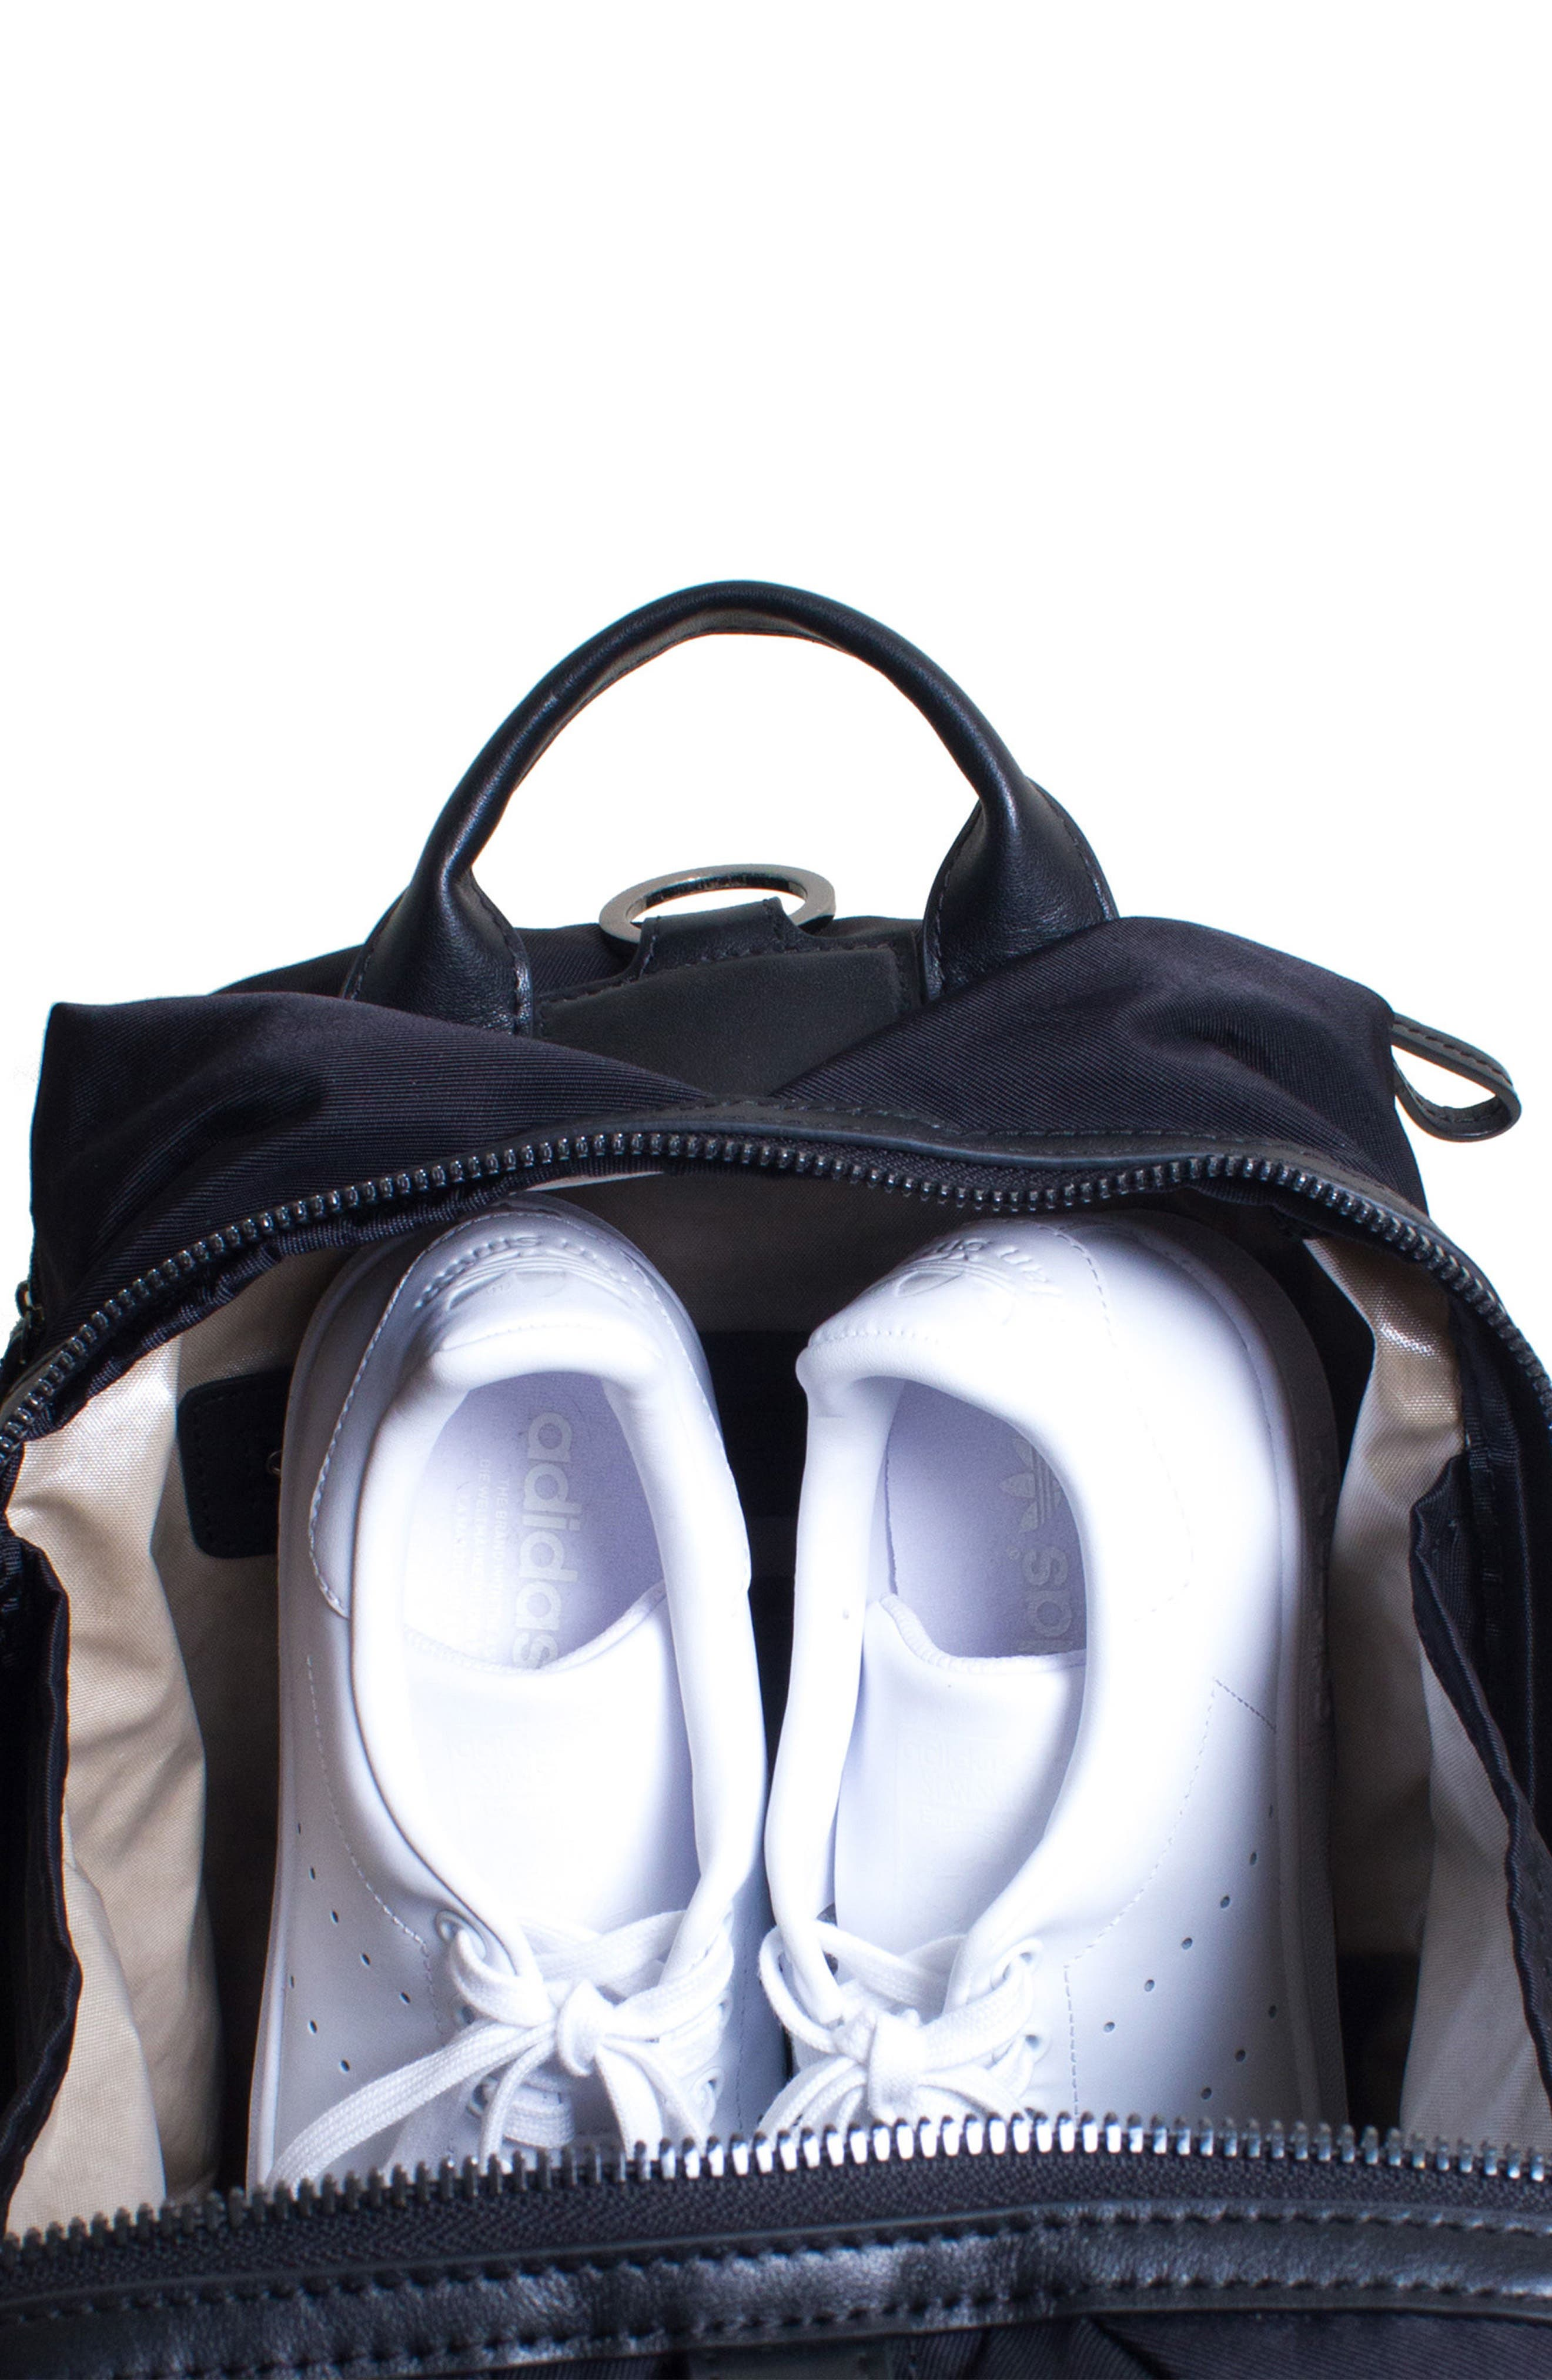 Studio Medium Duffel Backpack,                             Alternate thumbnail 2, color,                             001